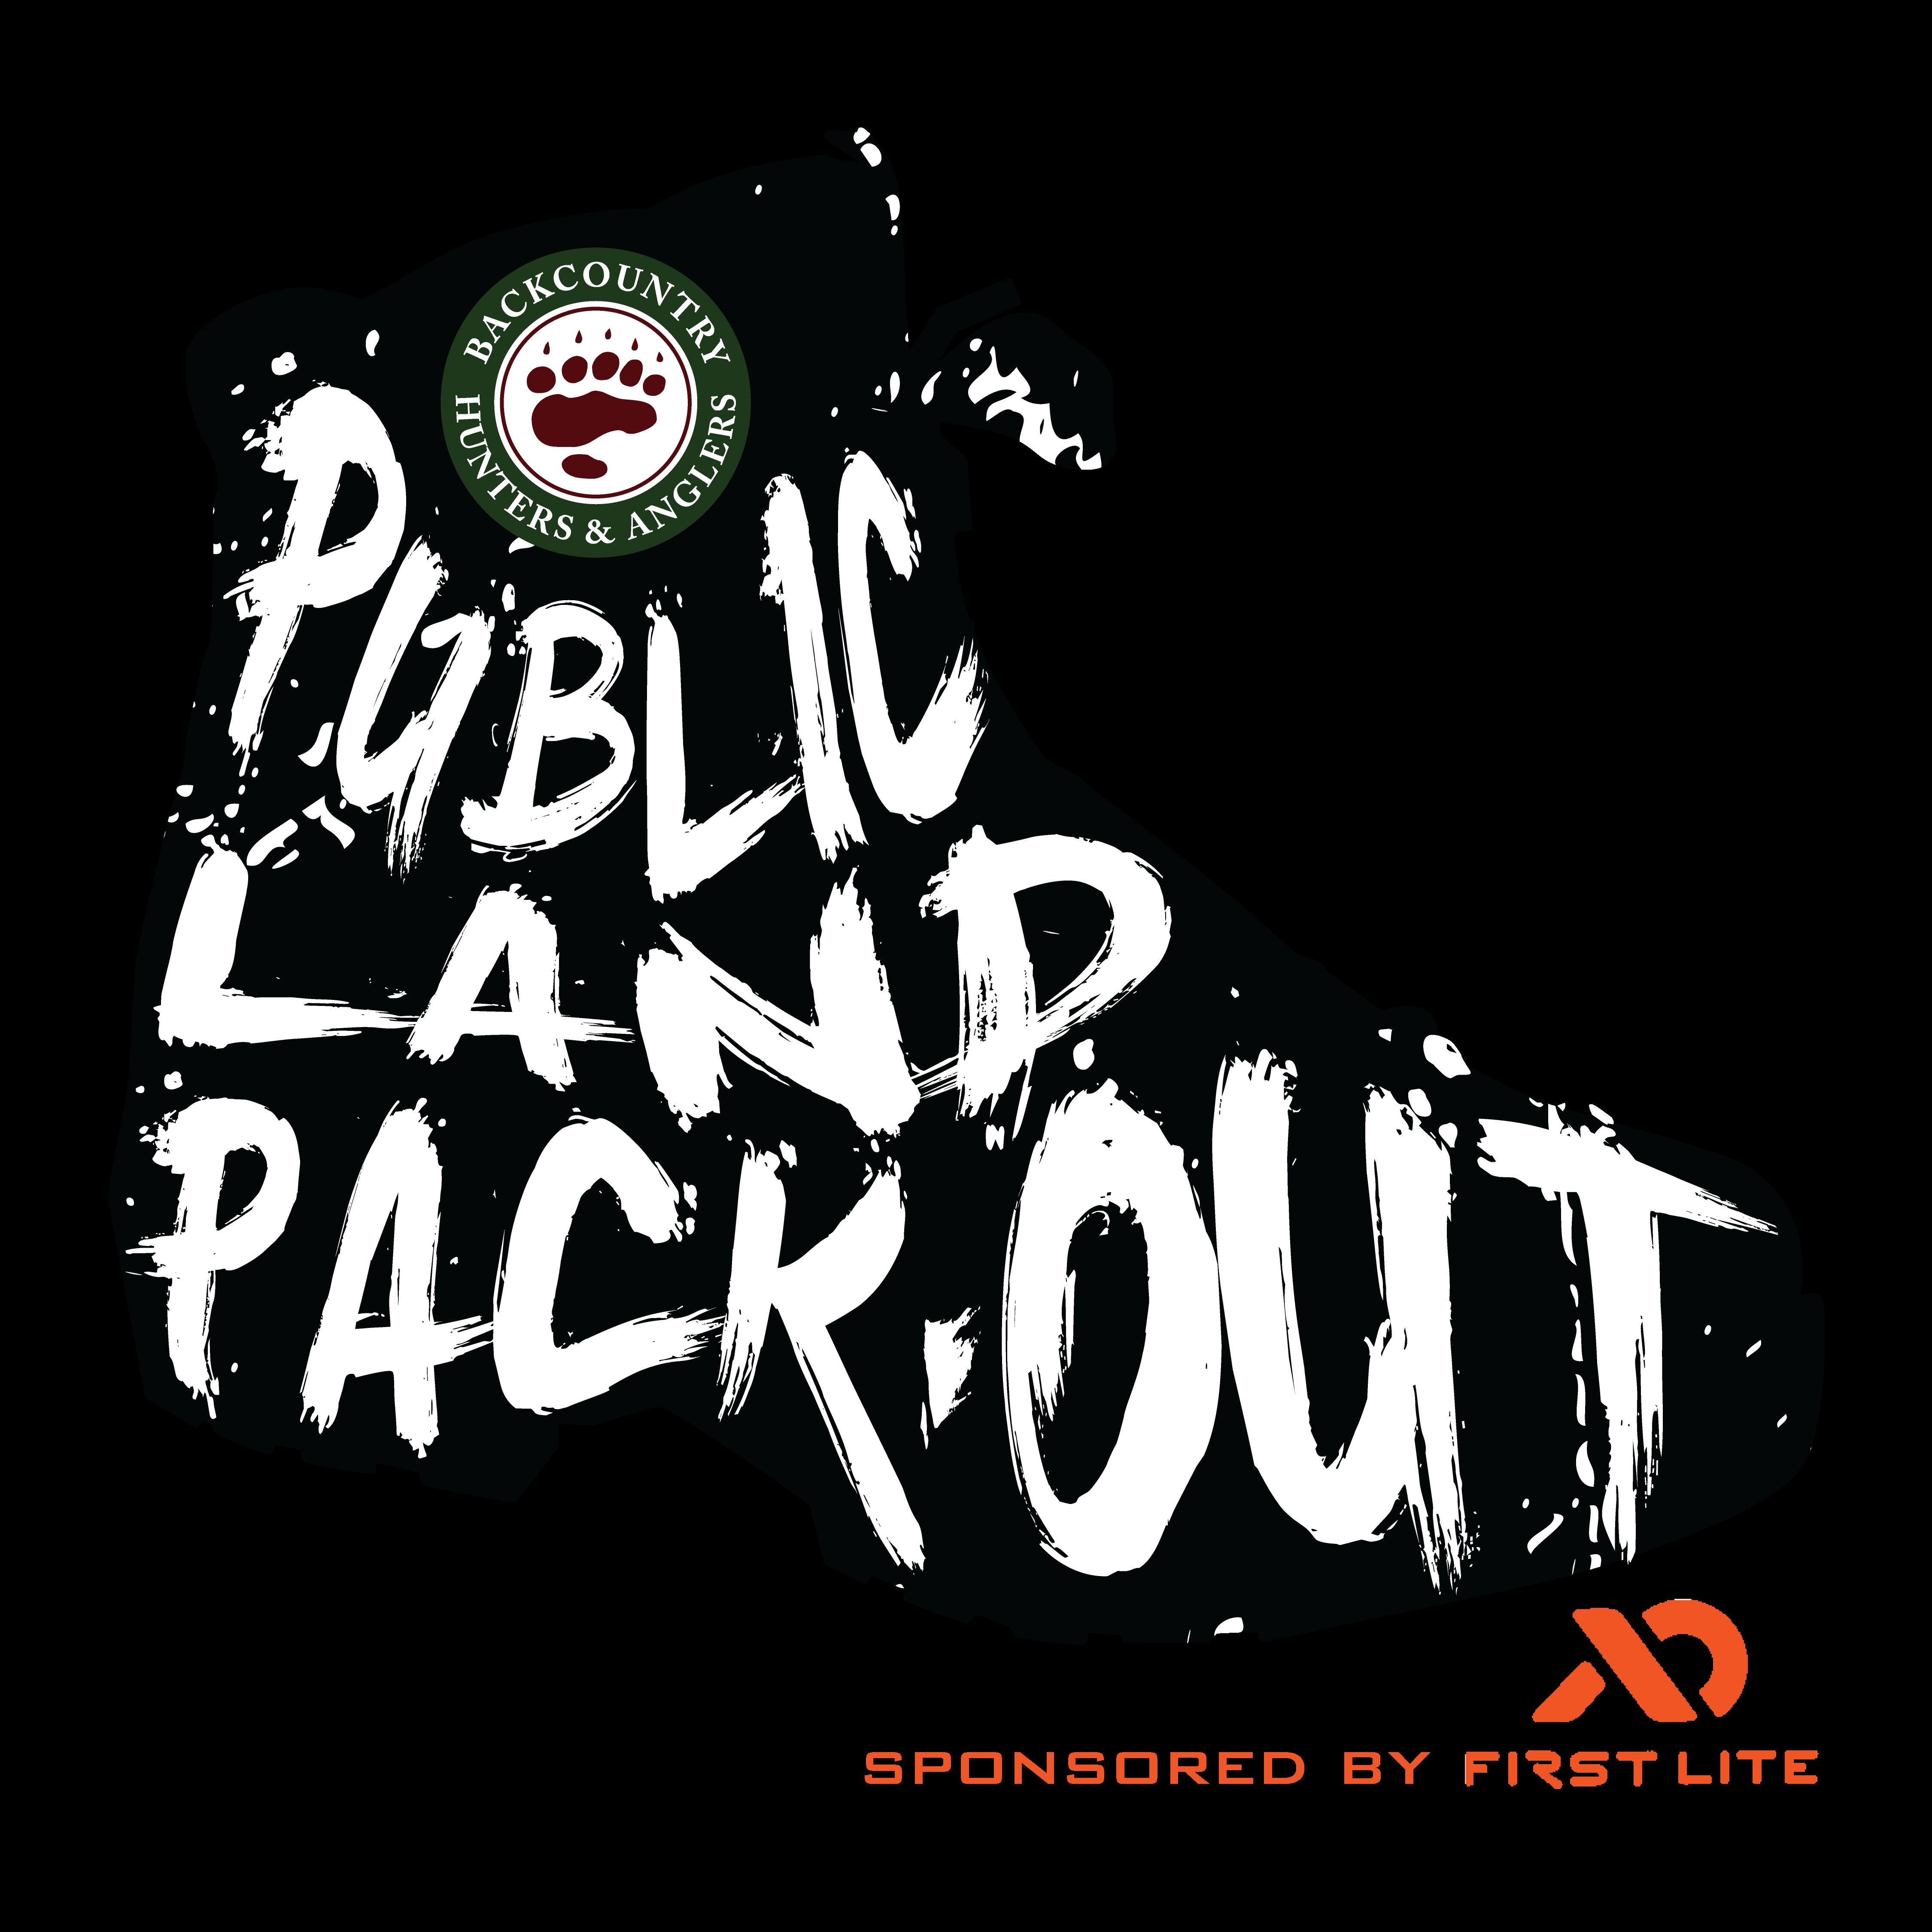 PLPO_bootLOGO-01.png